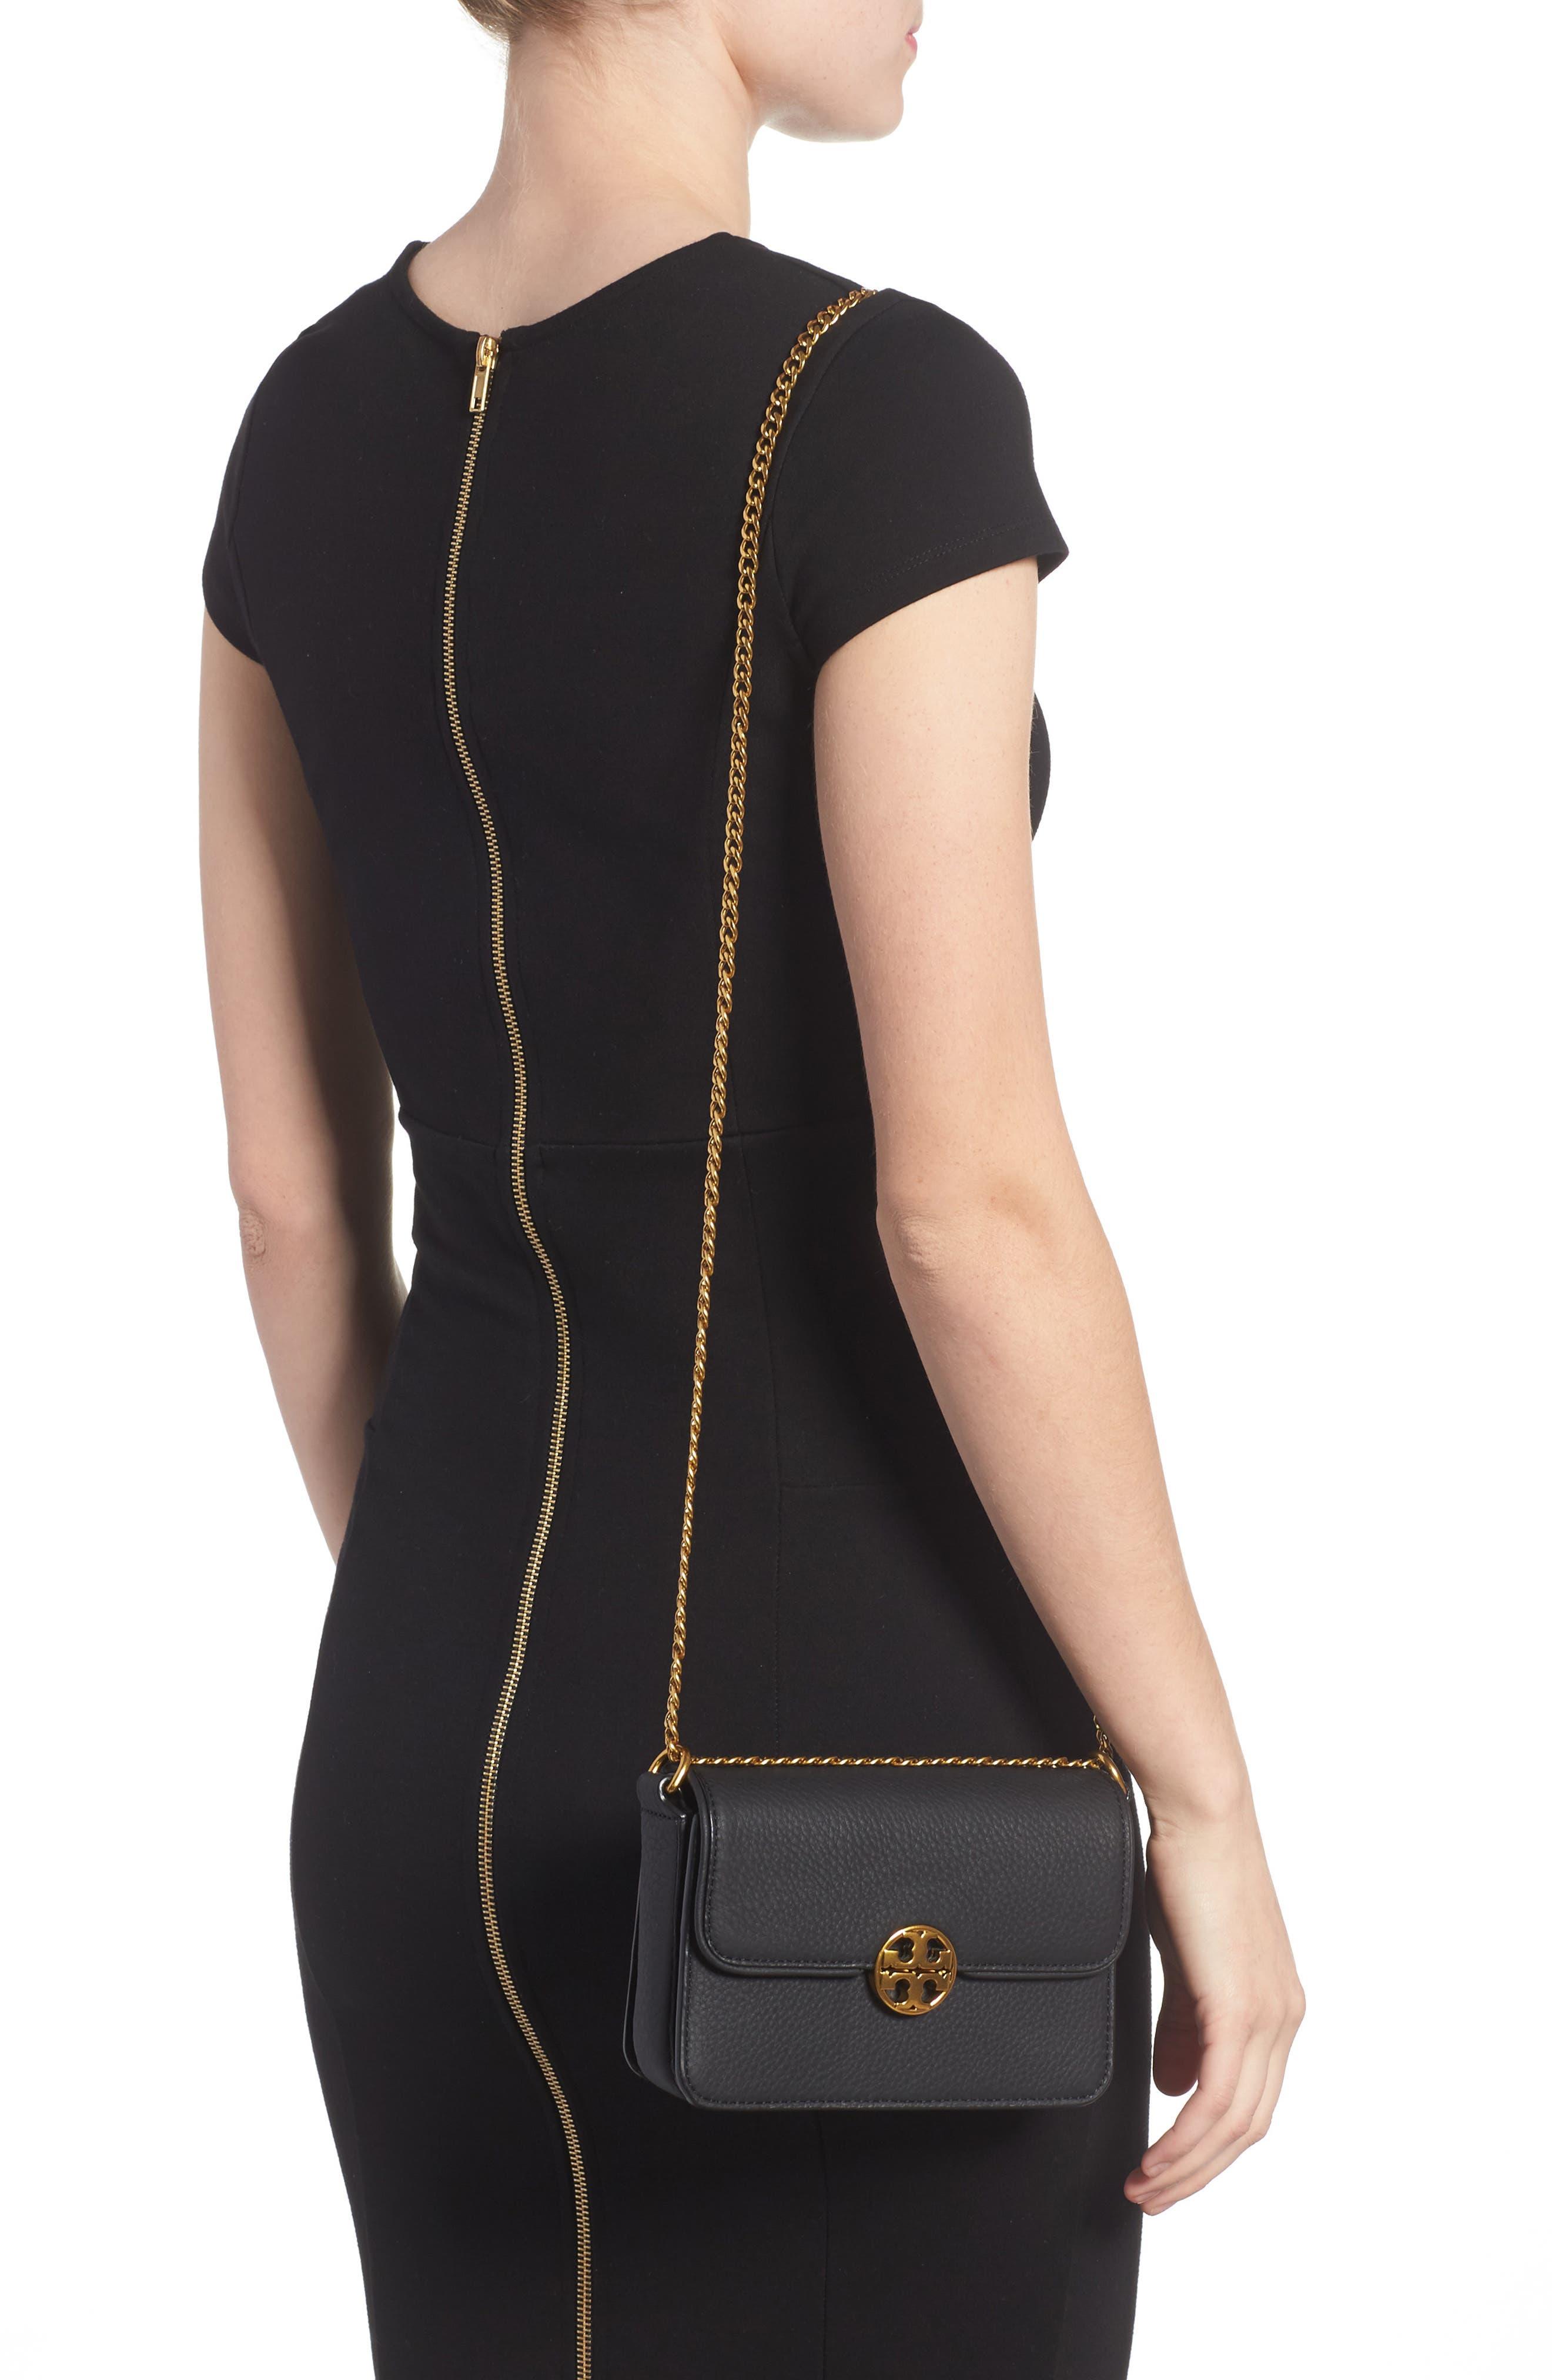 TORY BURCH,                             Mini Chelsea Leather Convertible Crossbody Bag,                             Alternate thumbnail 2, color,                             001